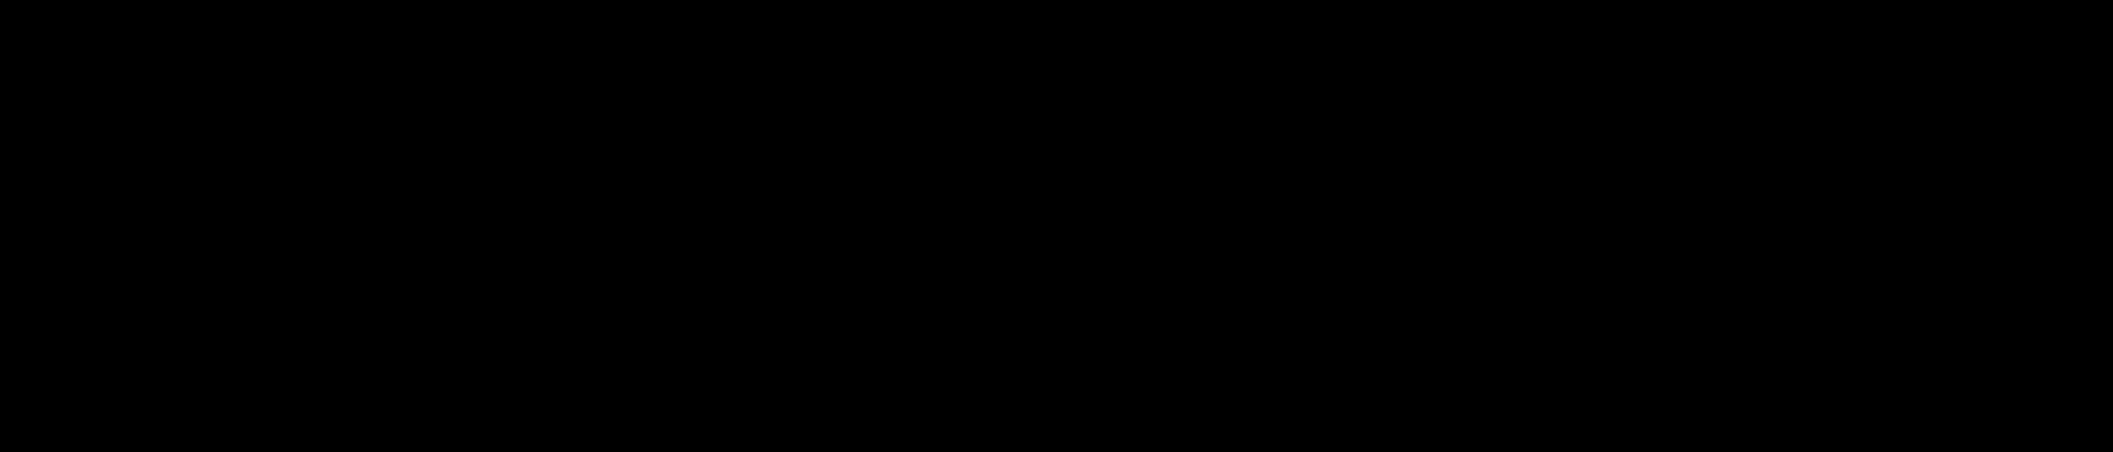 Lightsource logo